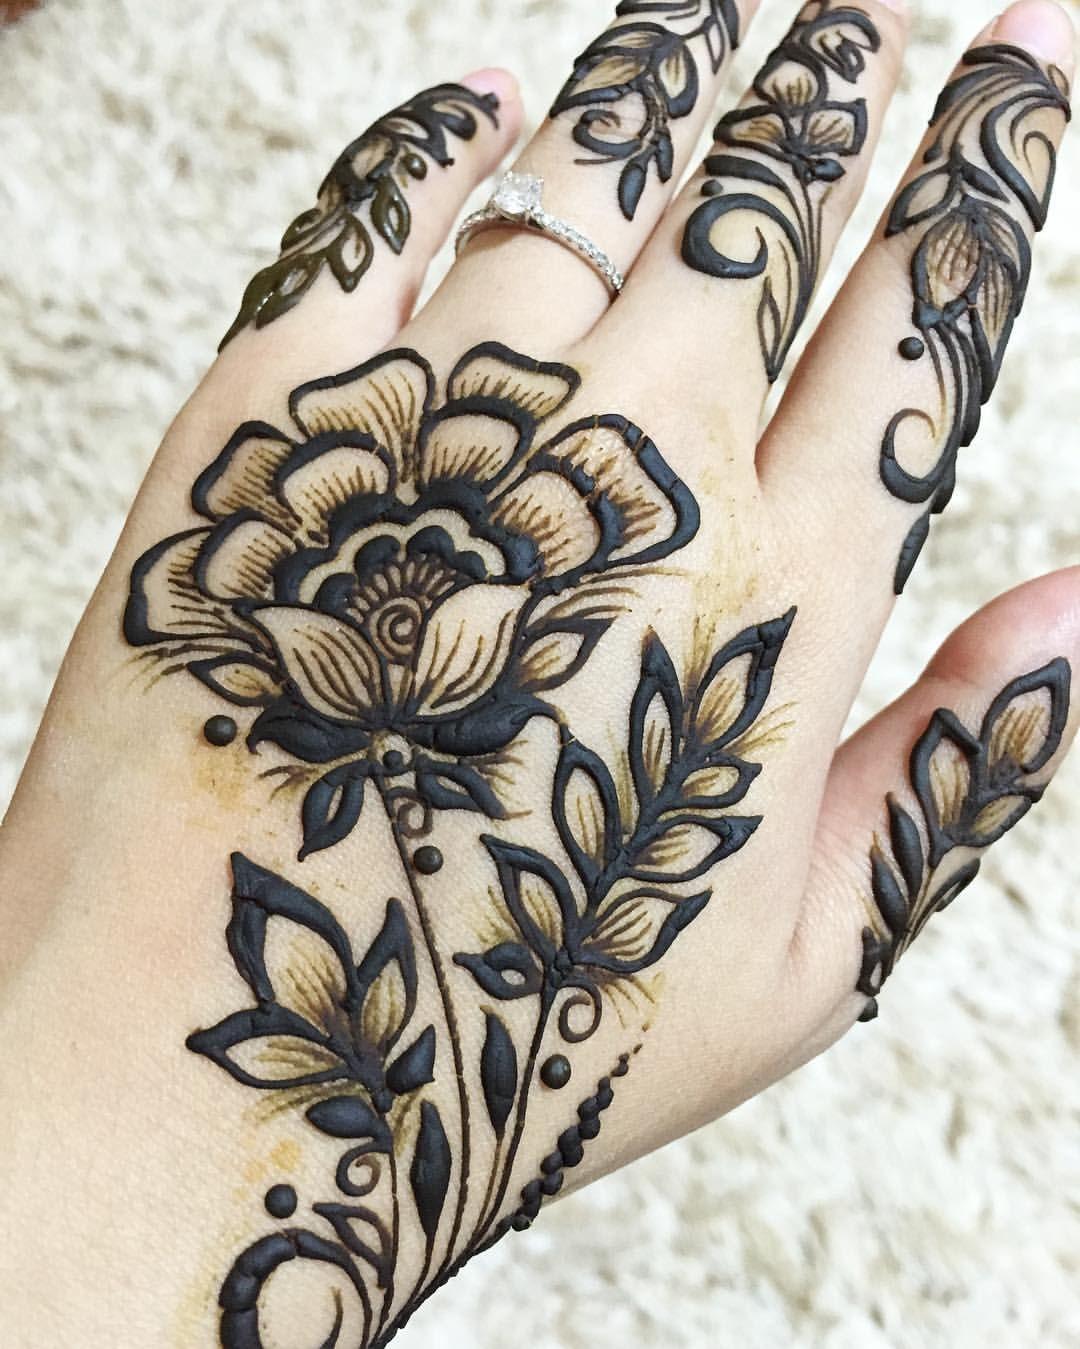 Side View Flower Hand Henna Henna Mehndi Mehndi Designs